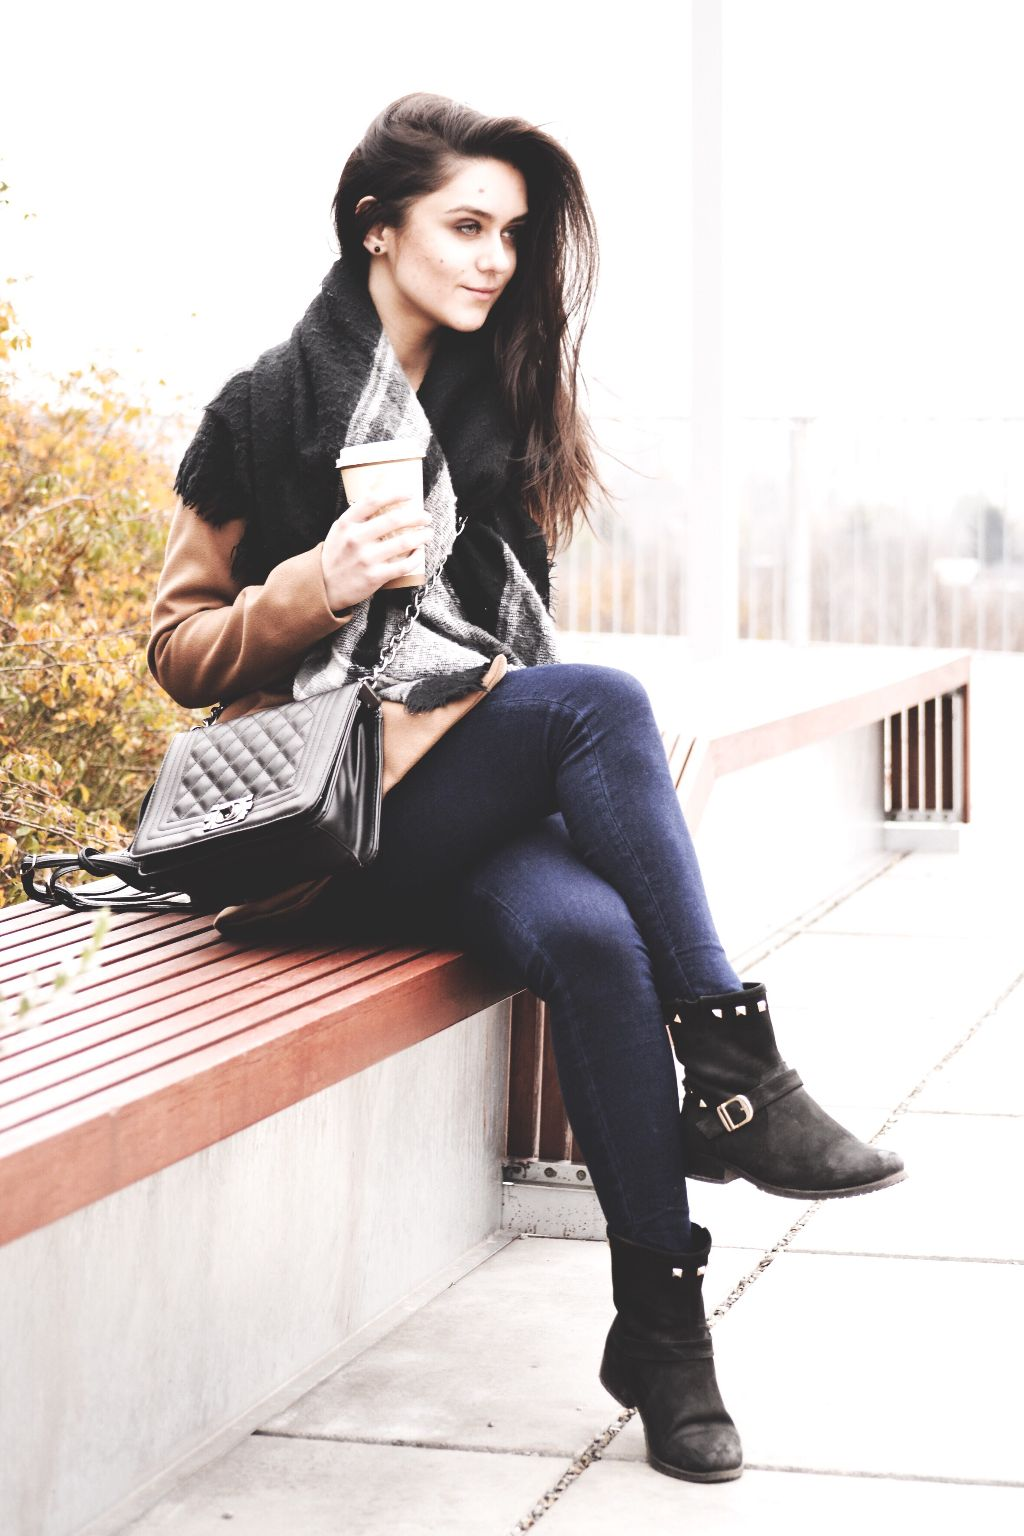 #poland #photography #photo #girl #coffee #freeze #cold #terasa